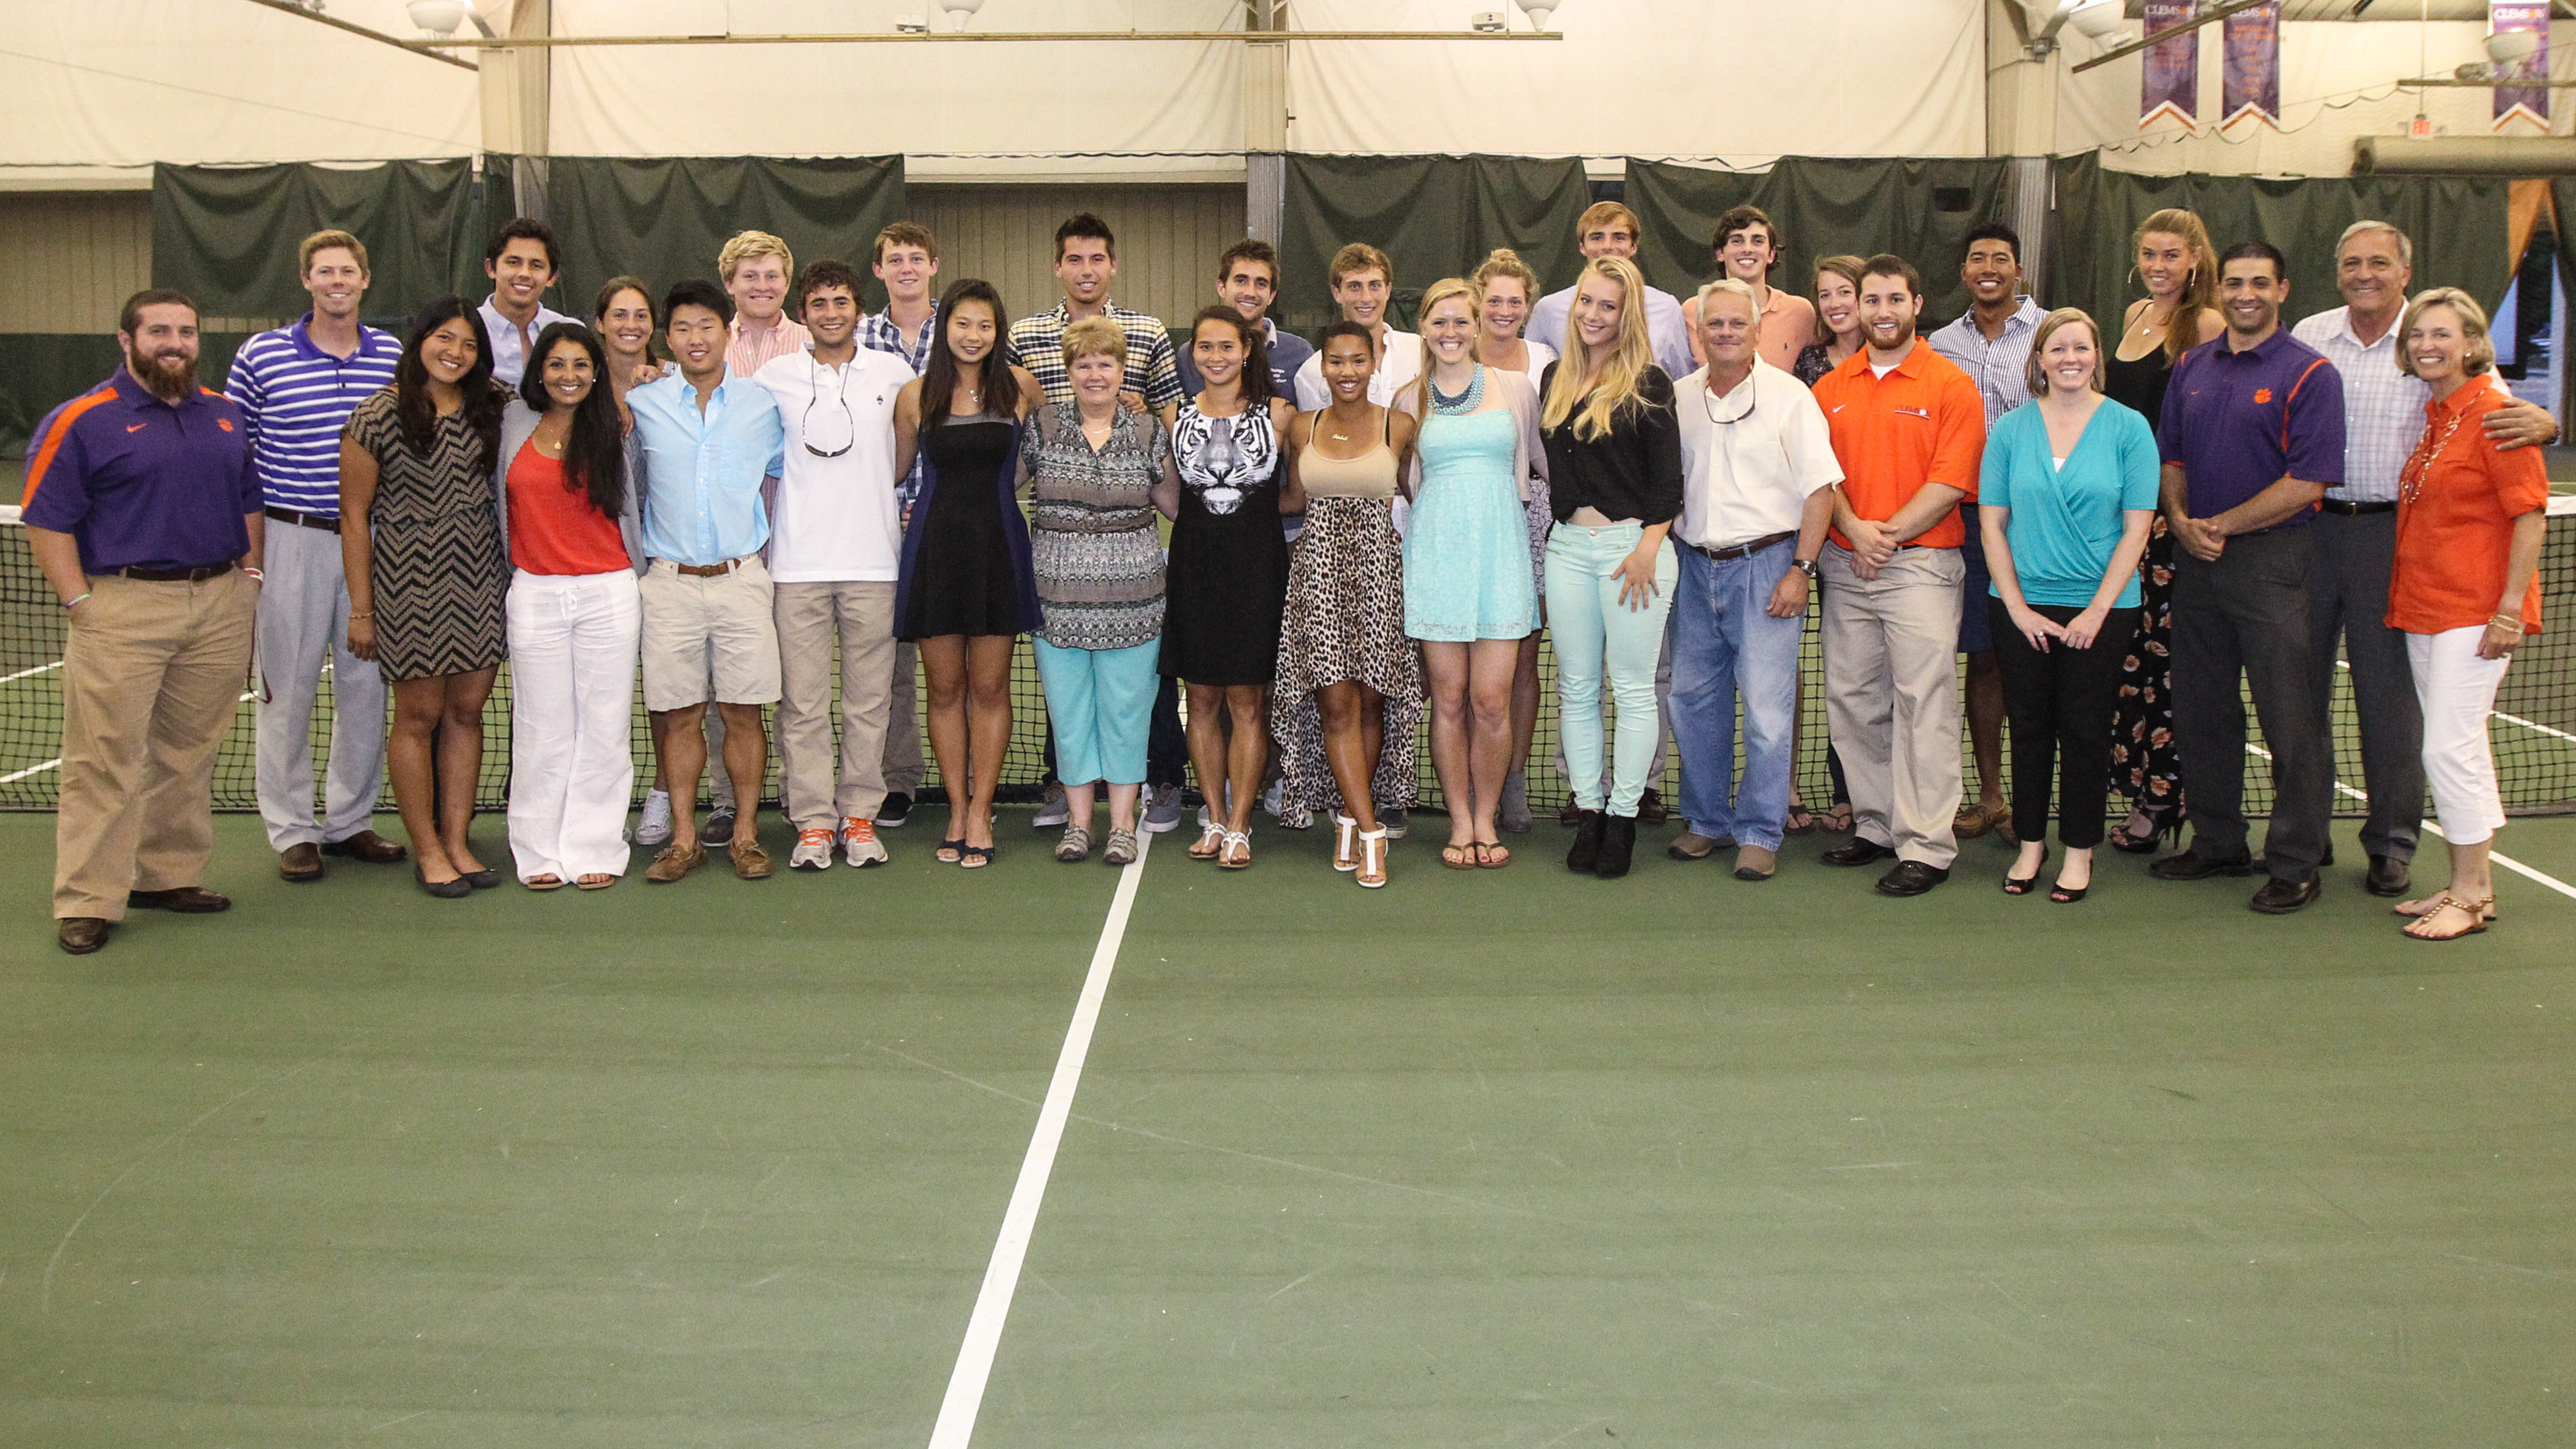 Clemson Tennis Teams Honor Student-Athletes at Awards Banquet